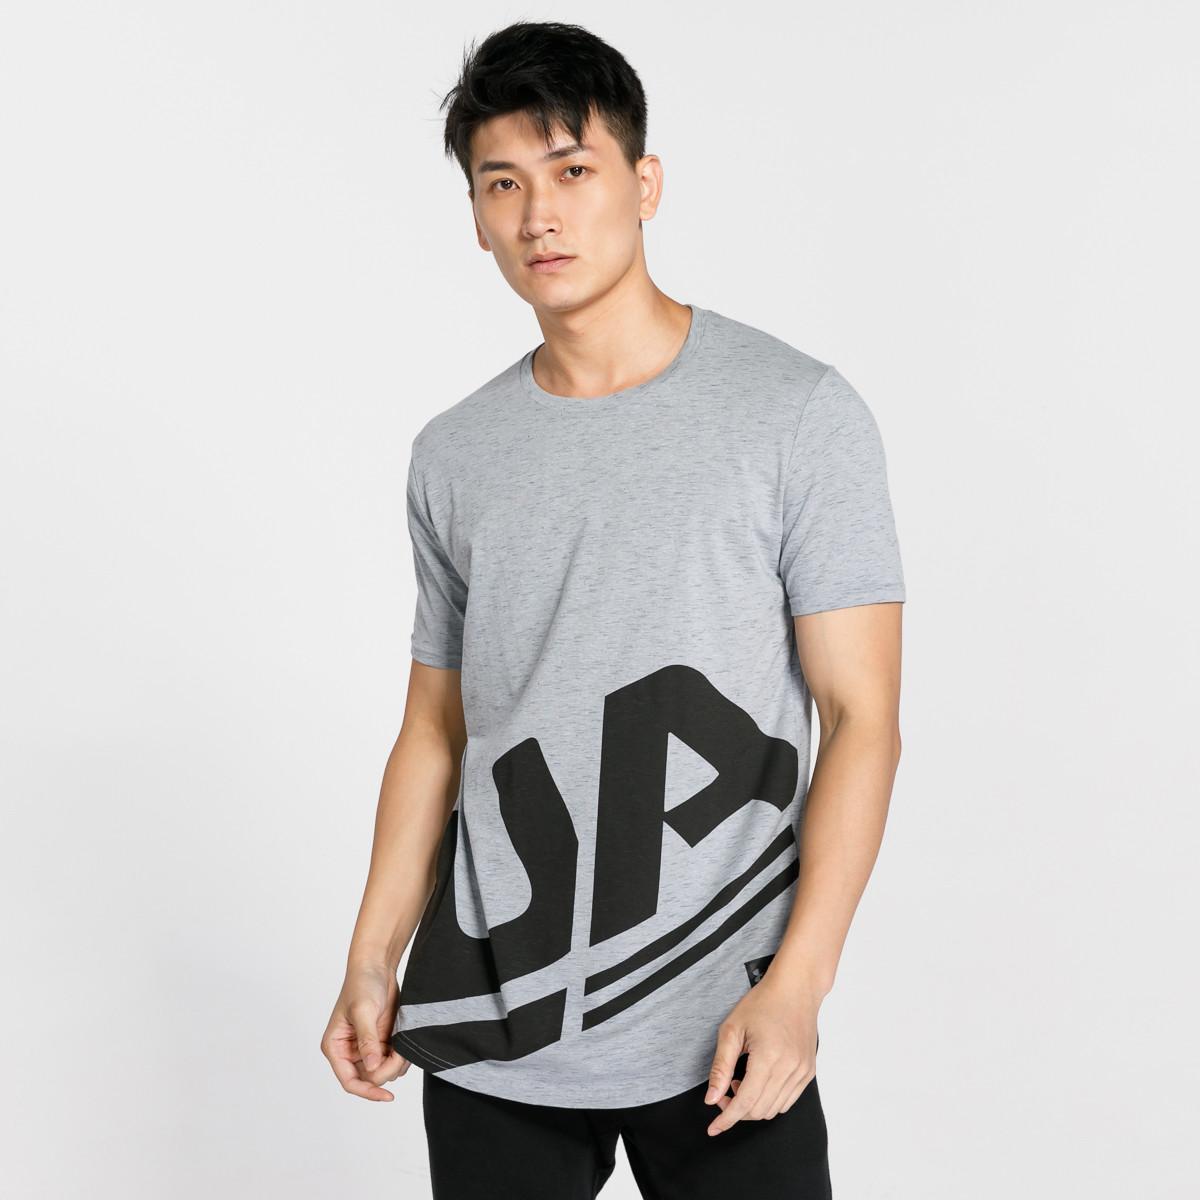 UNDER ARMOUR 安德玛 1318567 男士短袖T恤